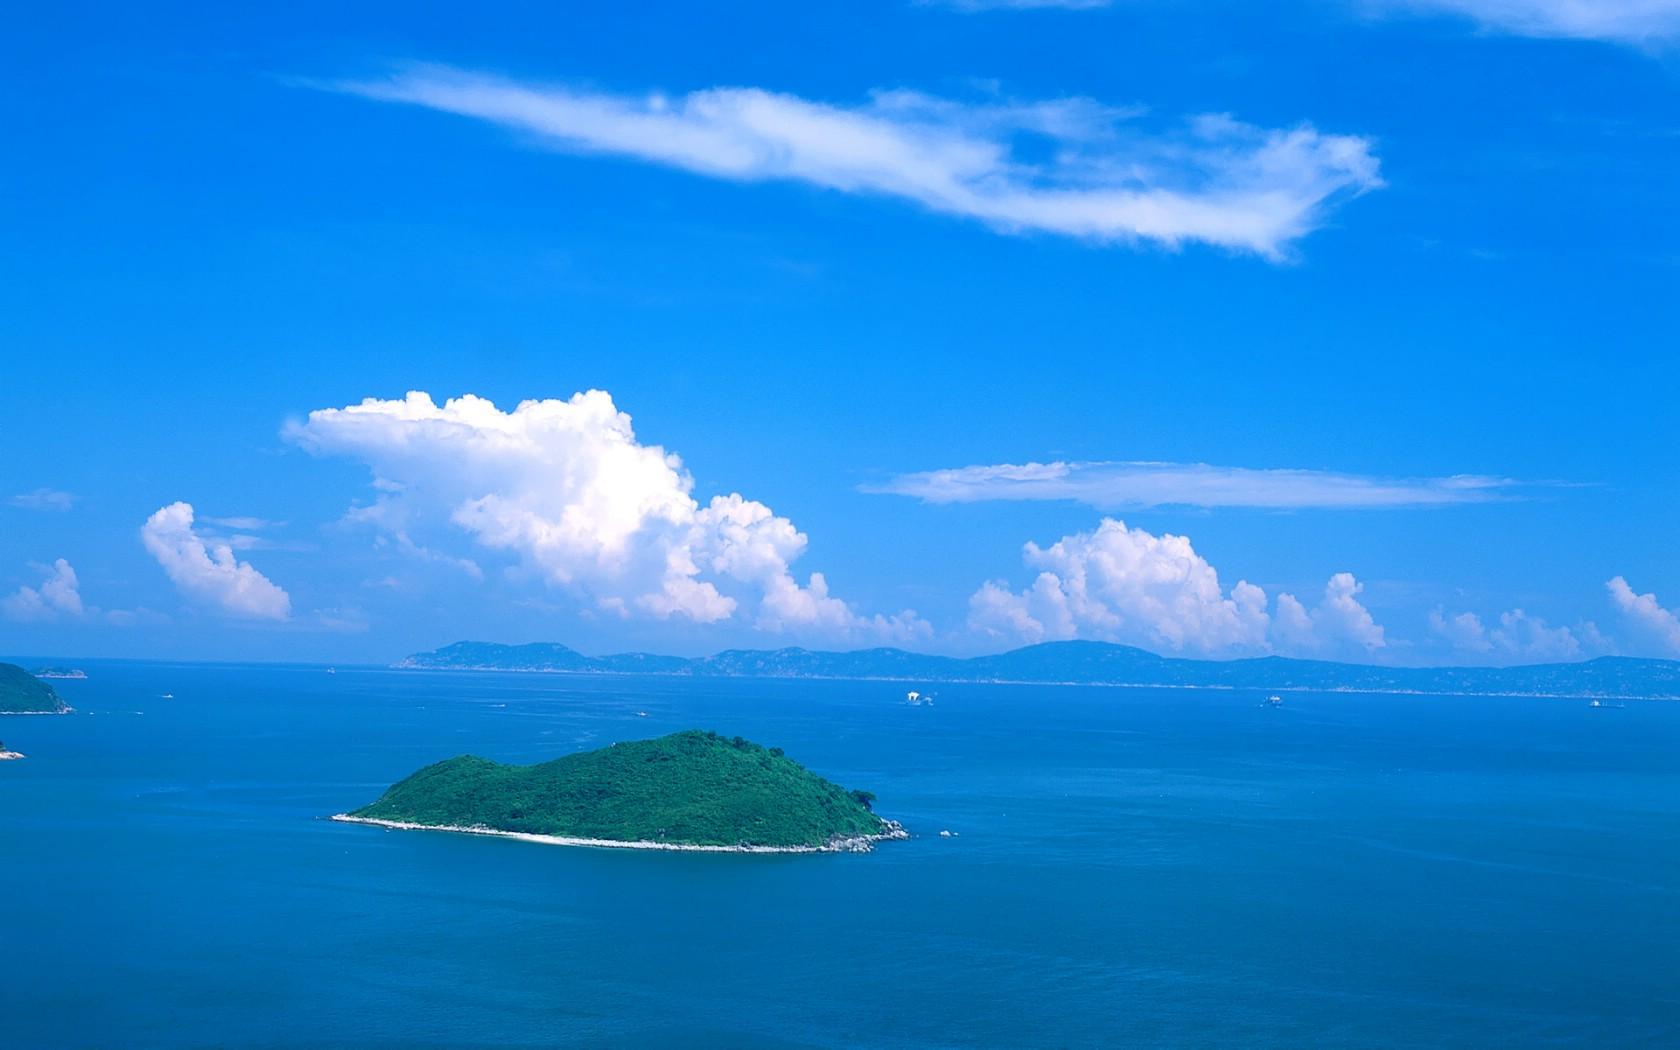 Islands 岛屿 电脑桌面壁纸图片